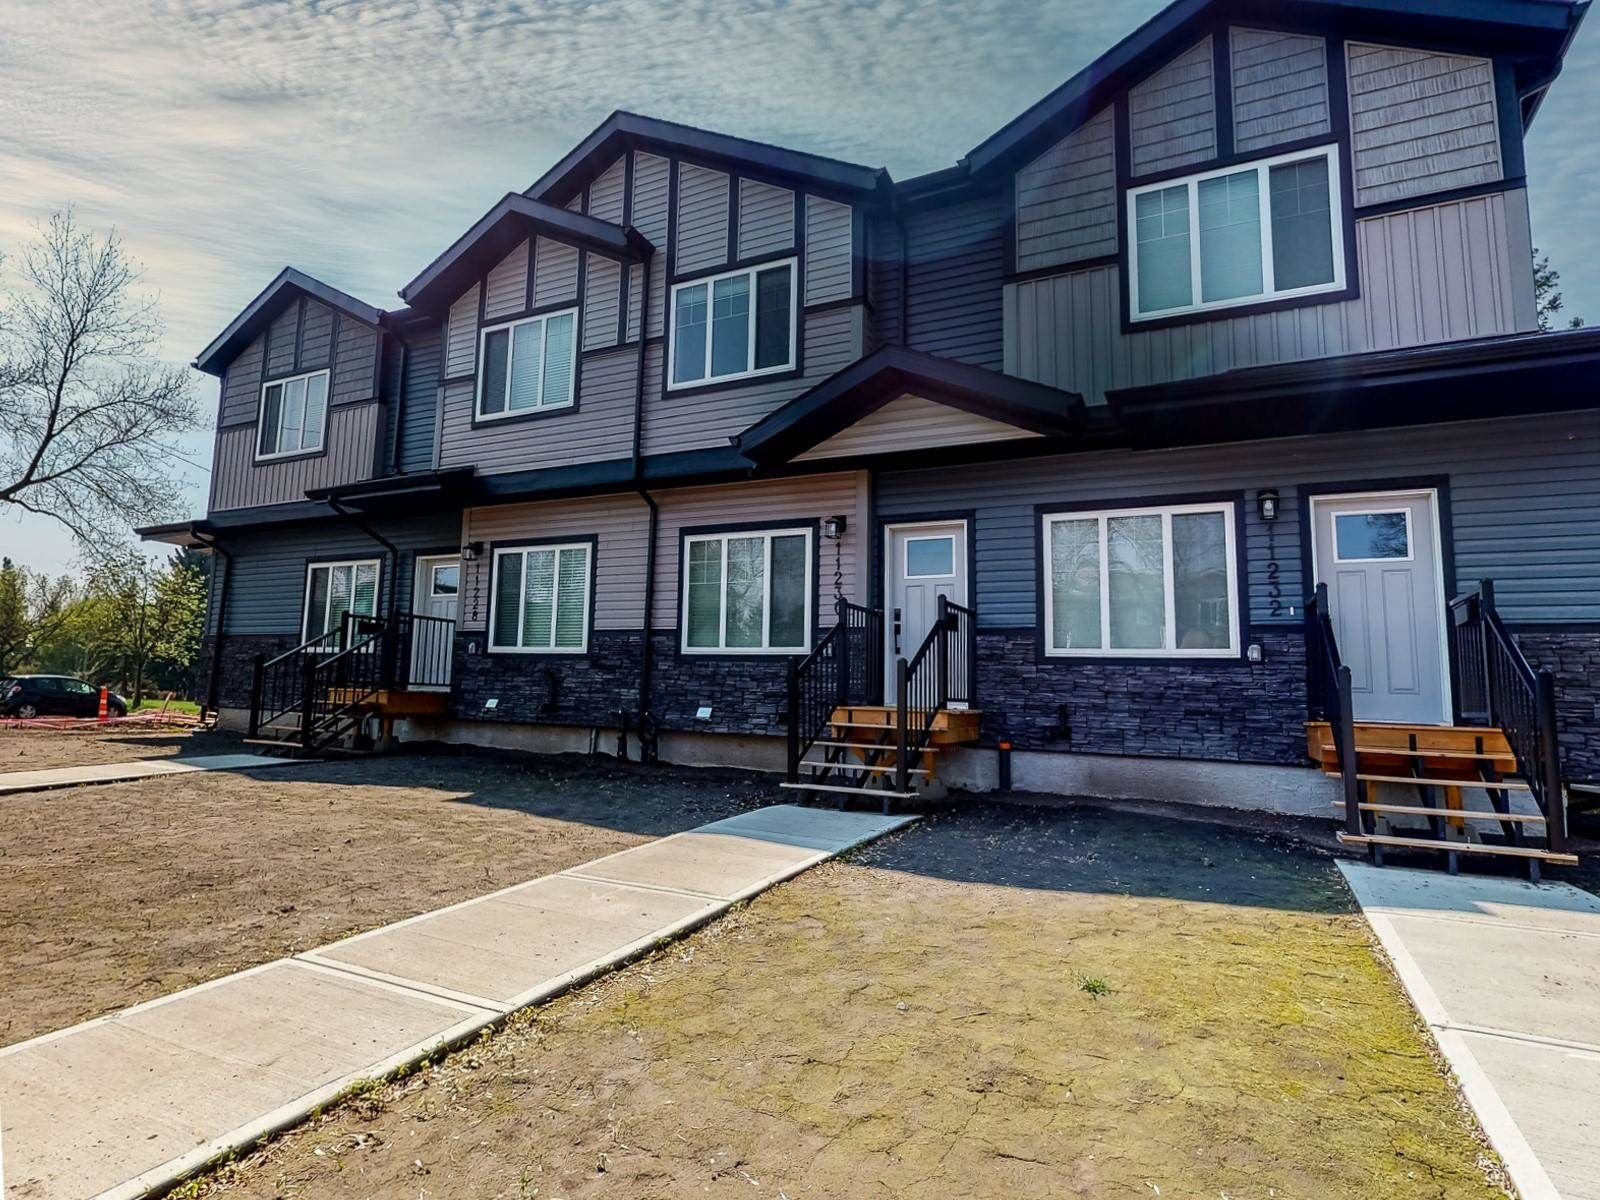 Main Photo: 11230 128 Street in Edmonton: Zone 07 Townhouse for sale : MLS®# E4245850